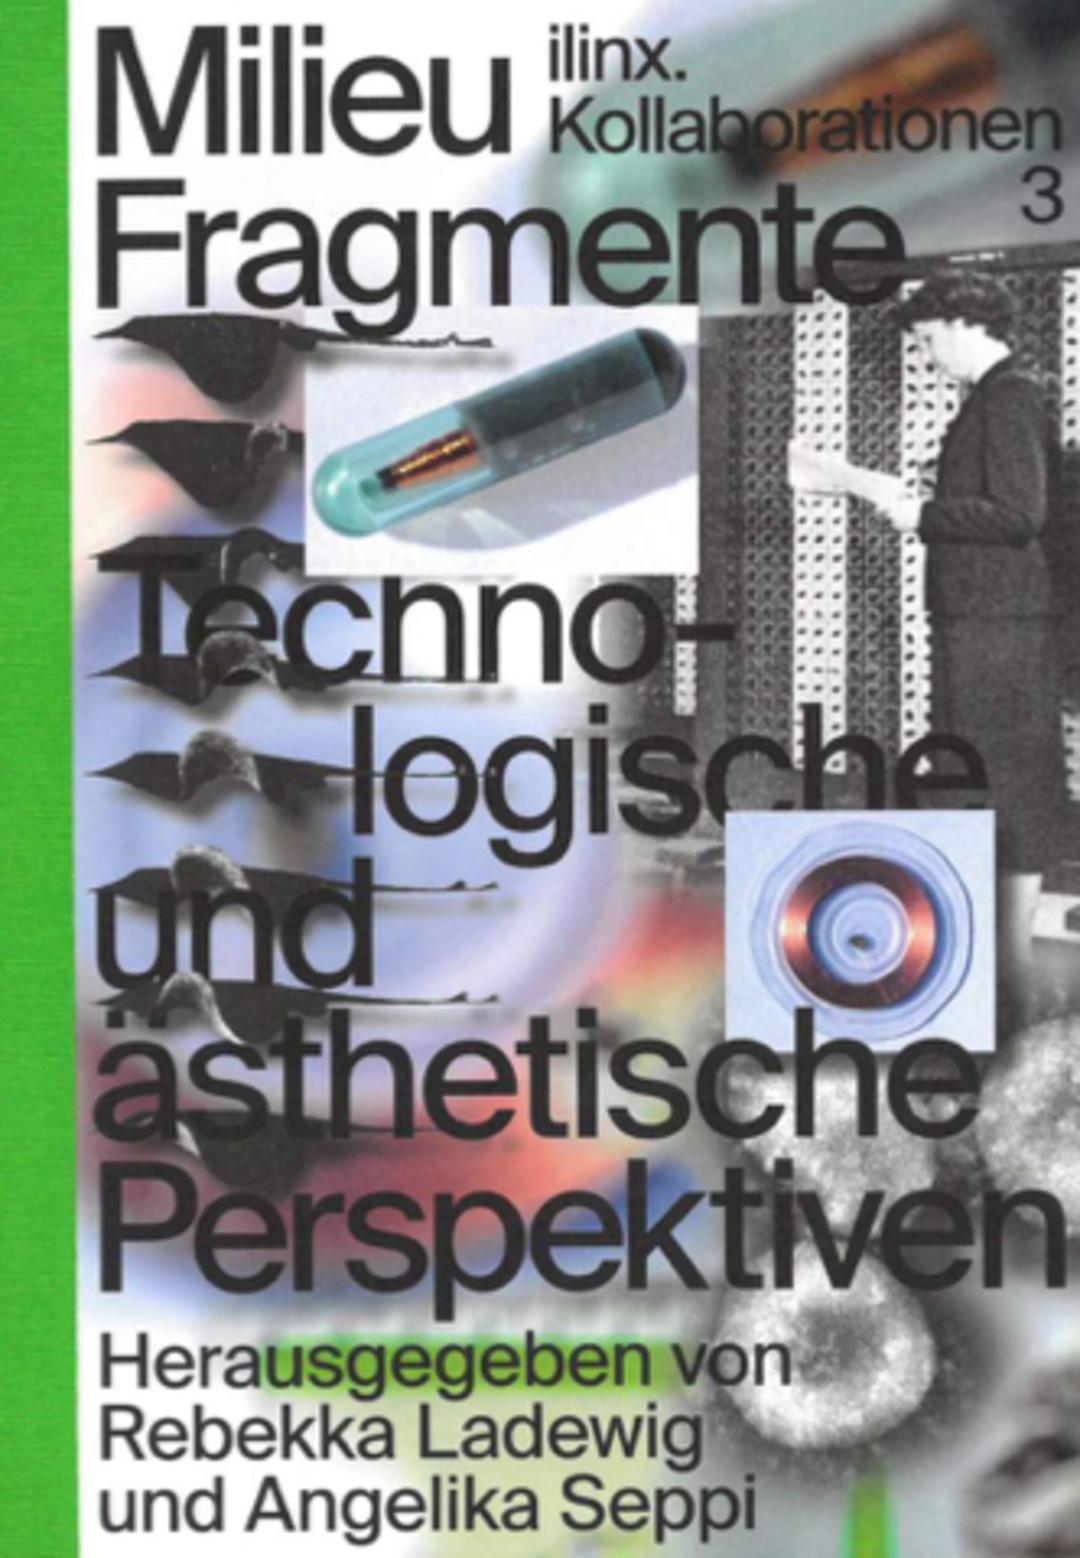 Bookcover »Milieu Fragmente«. Design: Florian Lamm, Sascia Reibel. Copyrigt: Spector Books.